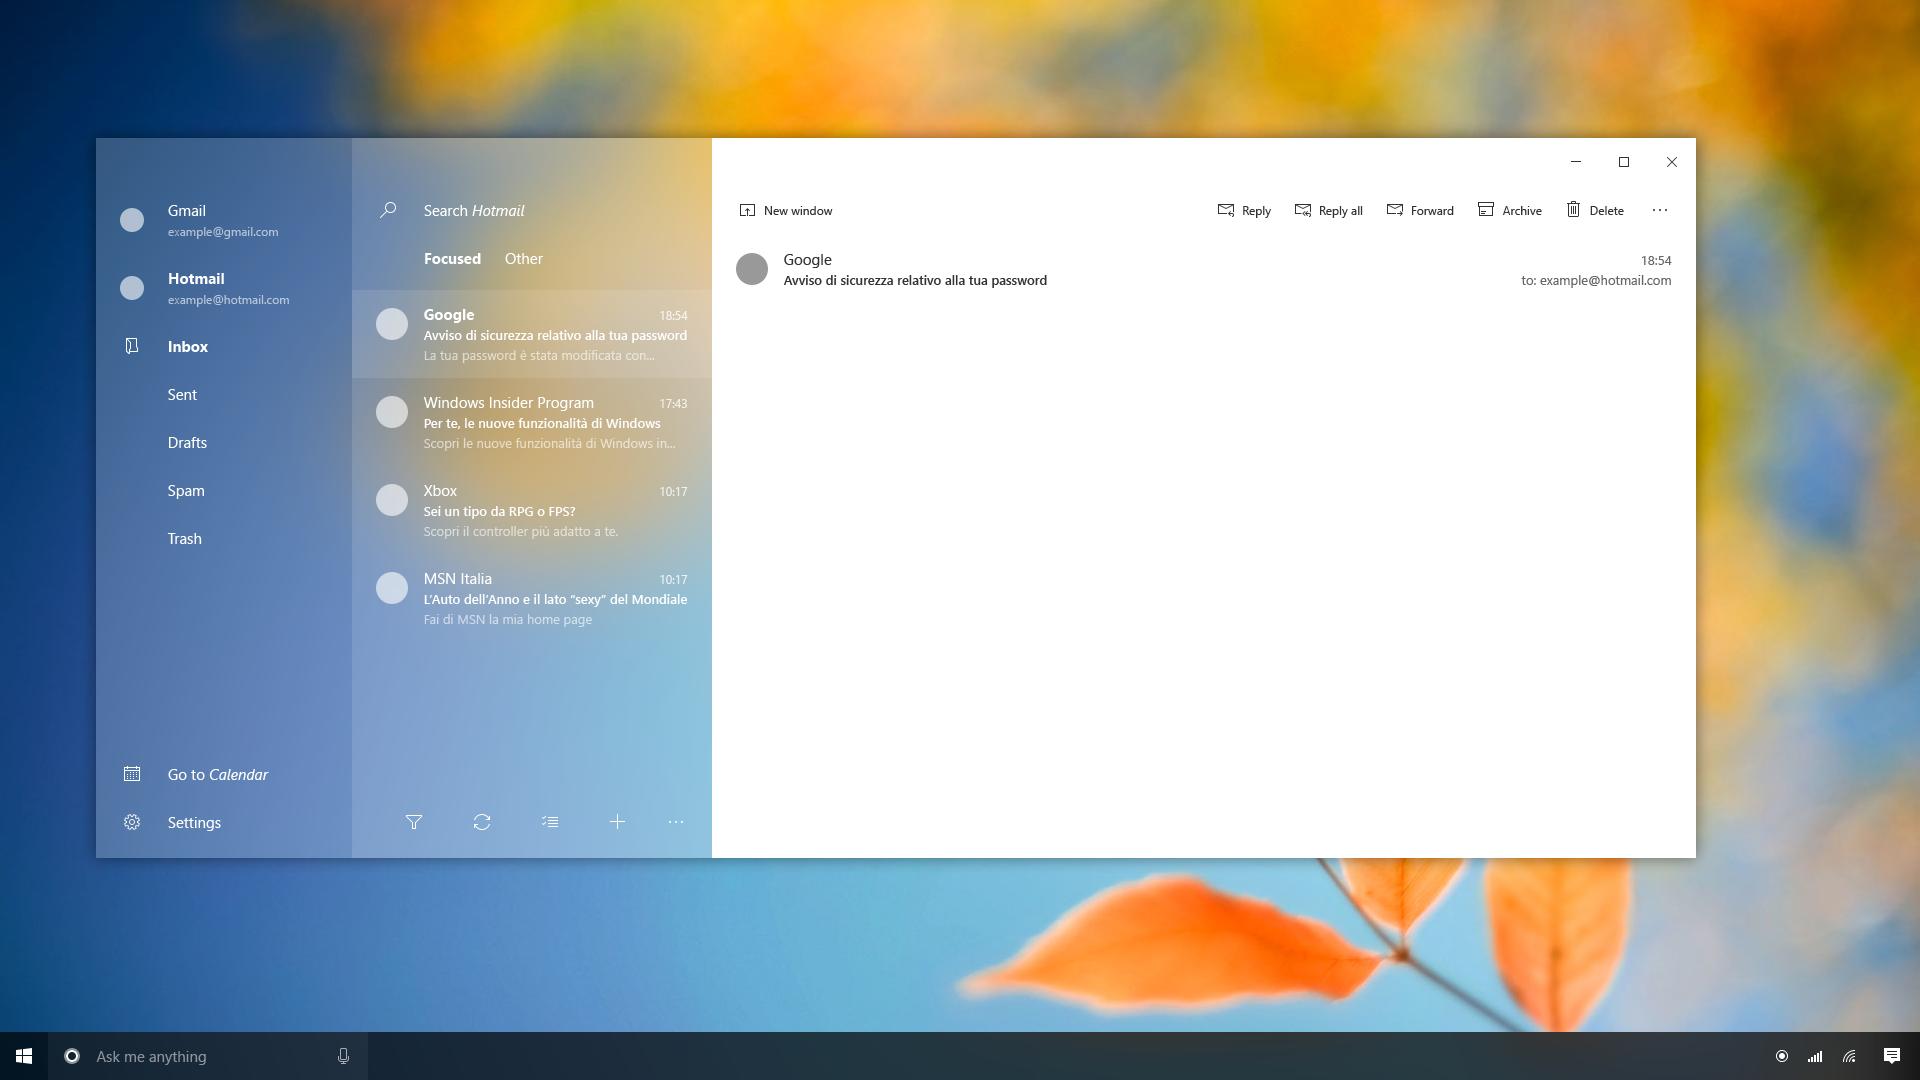 Mail App - Windows 10 Project Neon Concept